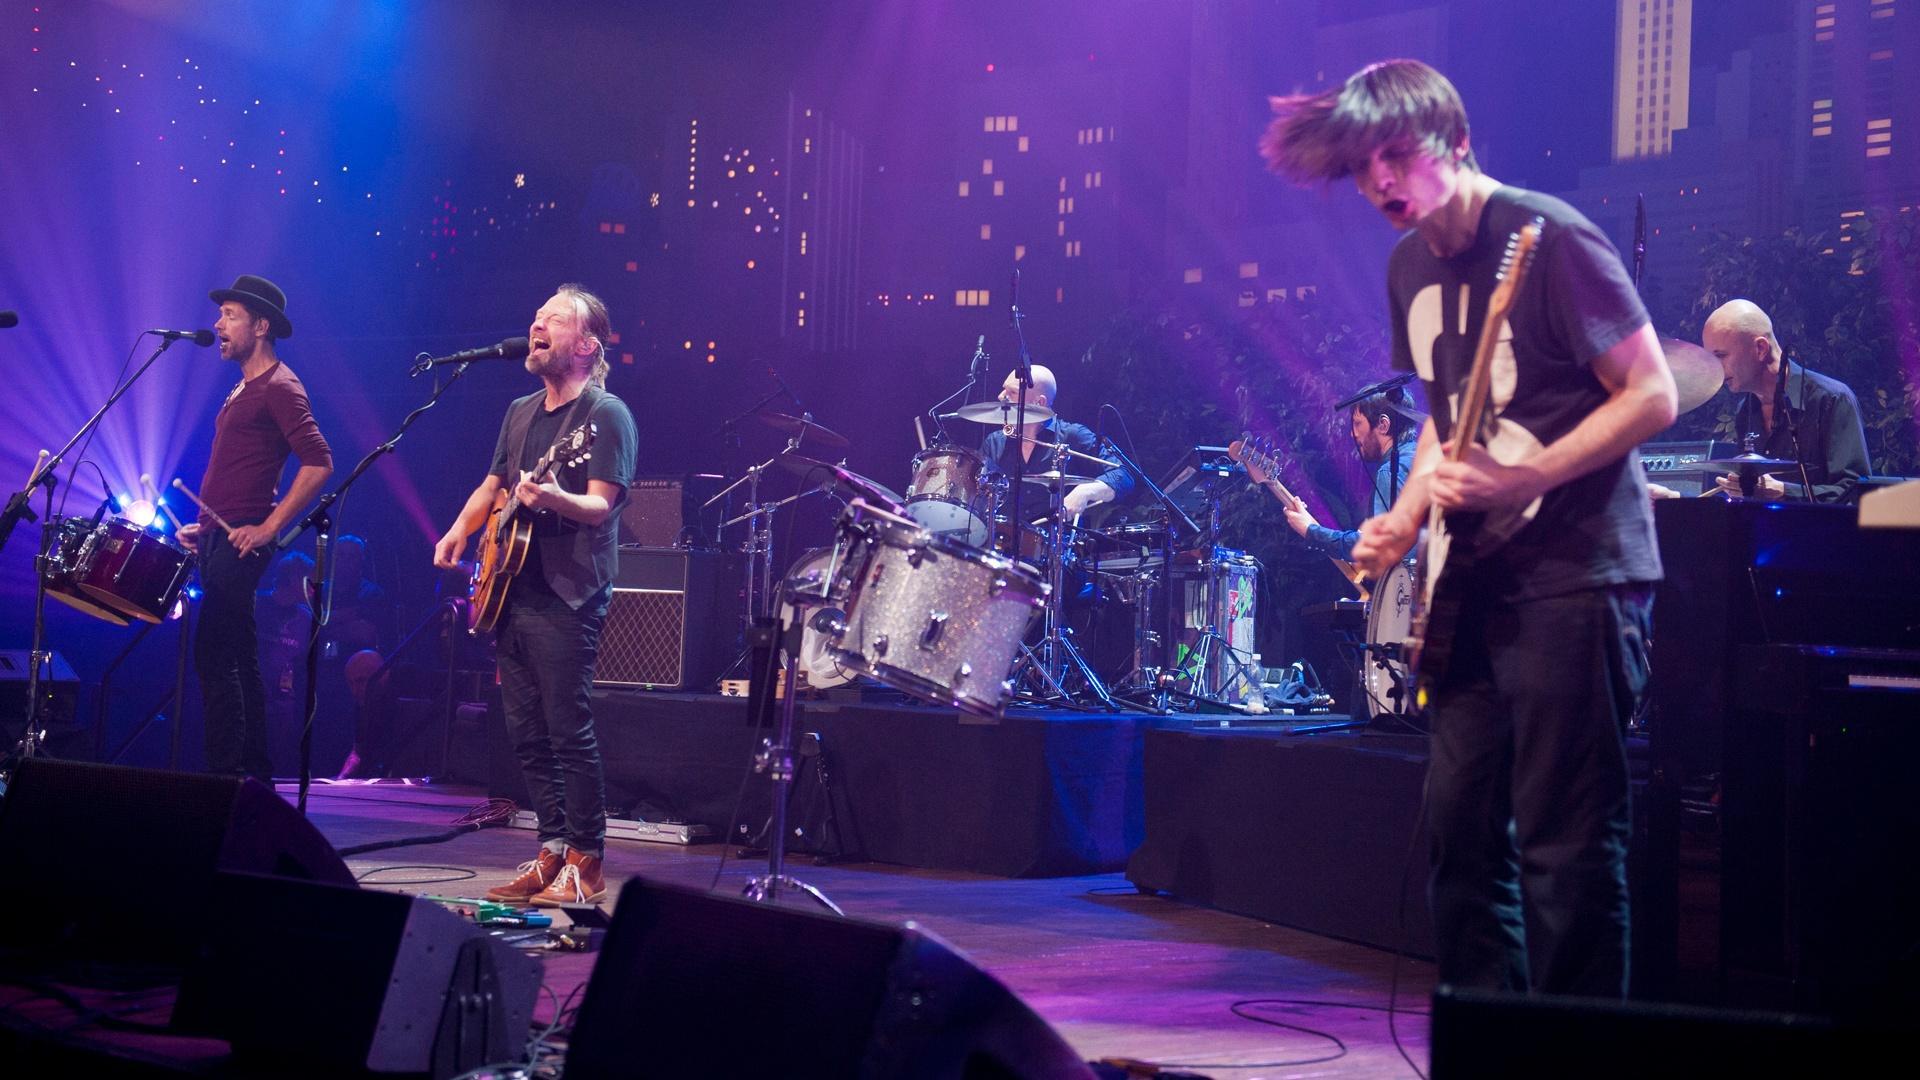 Radiohead austin city limits pbs voltagebd Choice Image